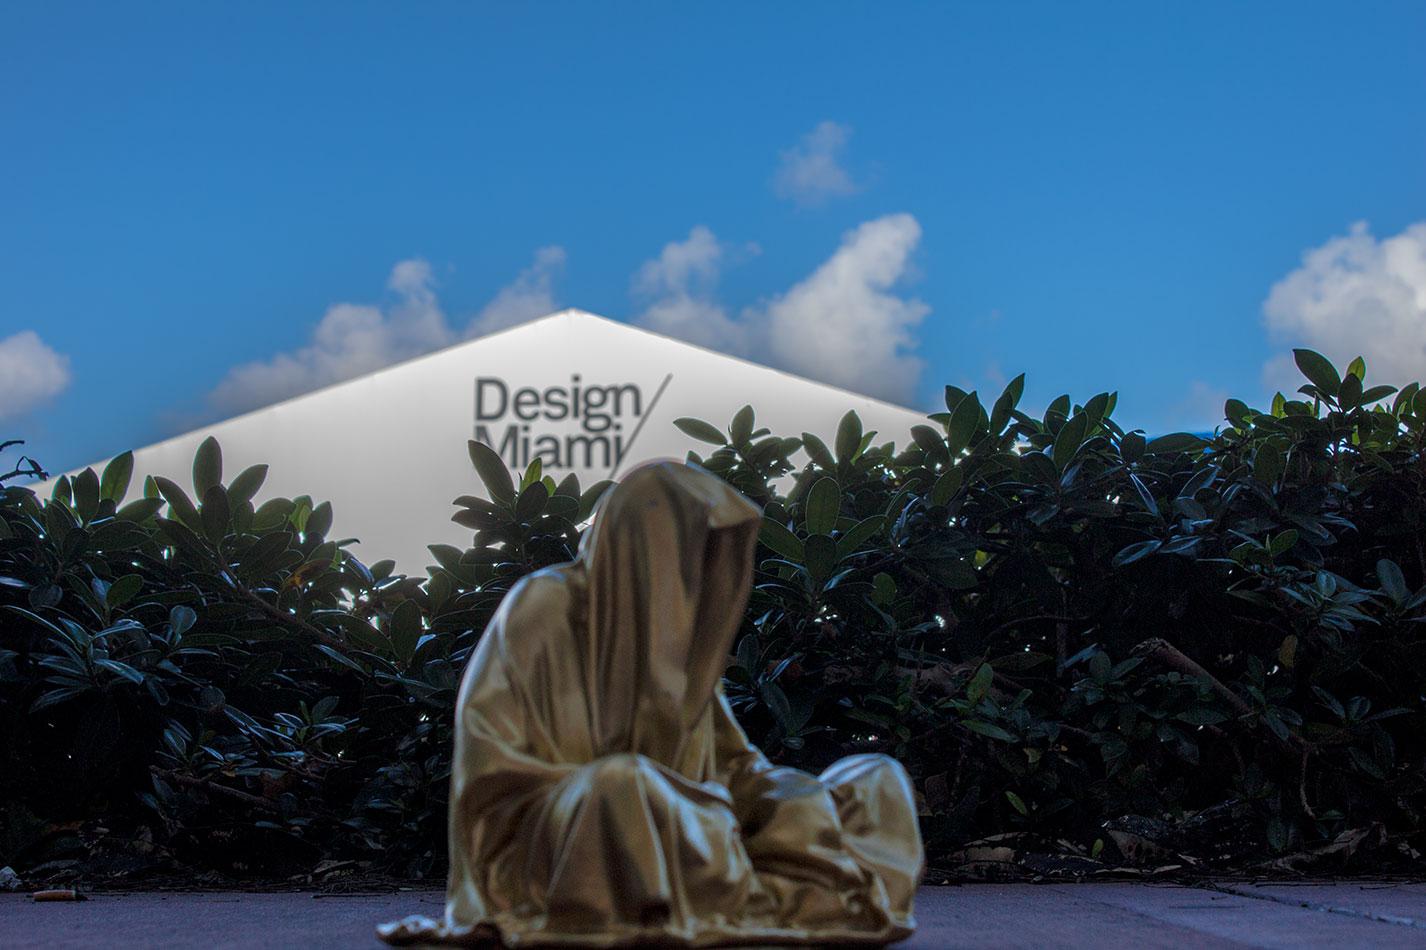 public-art-basel-miami-beach-fair-usa-florida-bass-museum-guardians-of-time-manfred-kili-kielnhofer-contemporary-fine-art-modern-arts-design-antiques-sculpture-6475